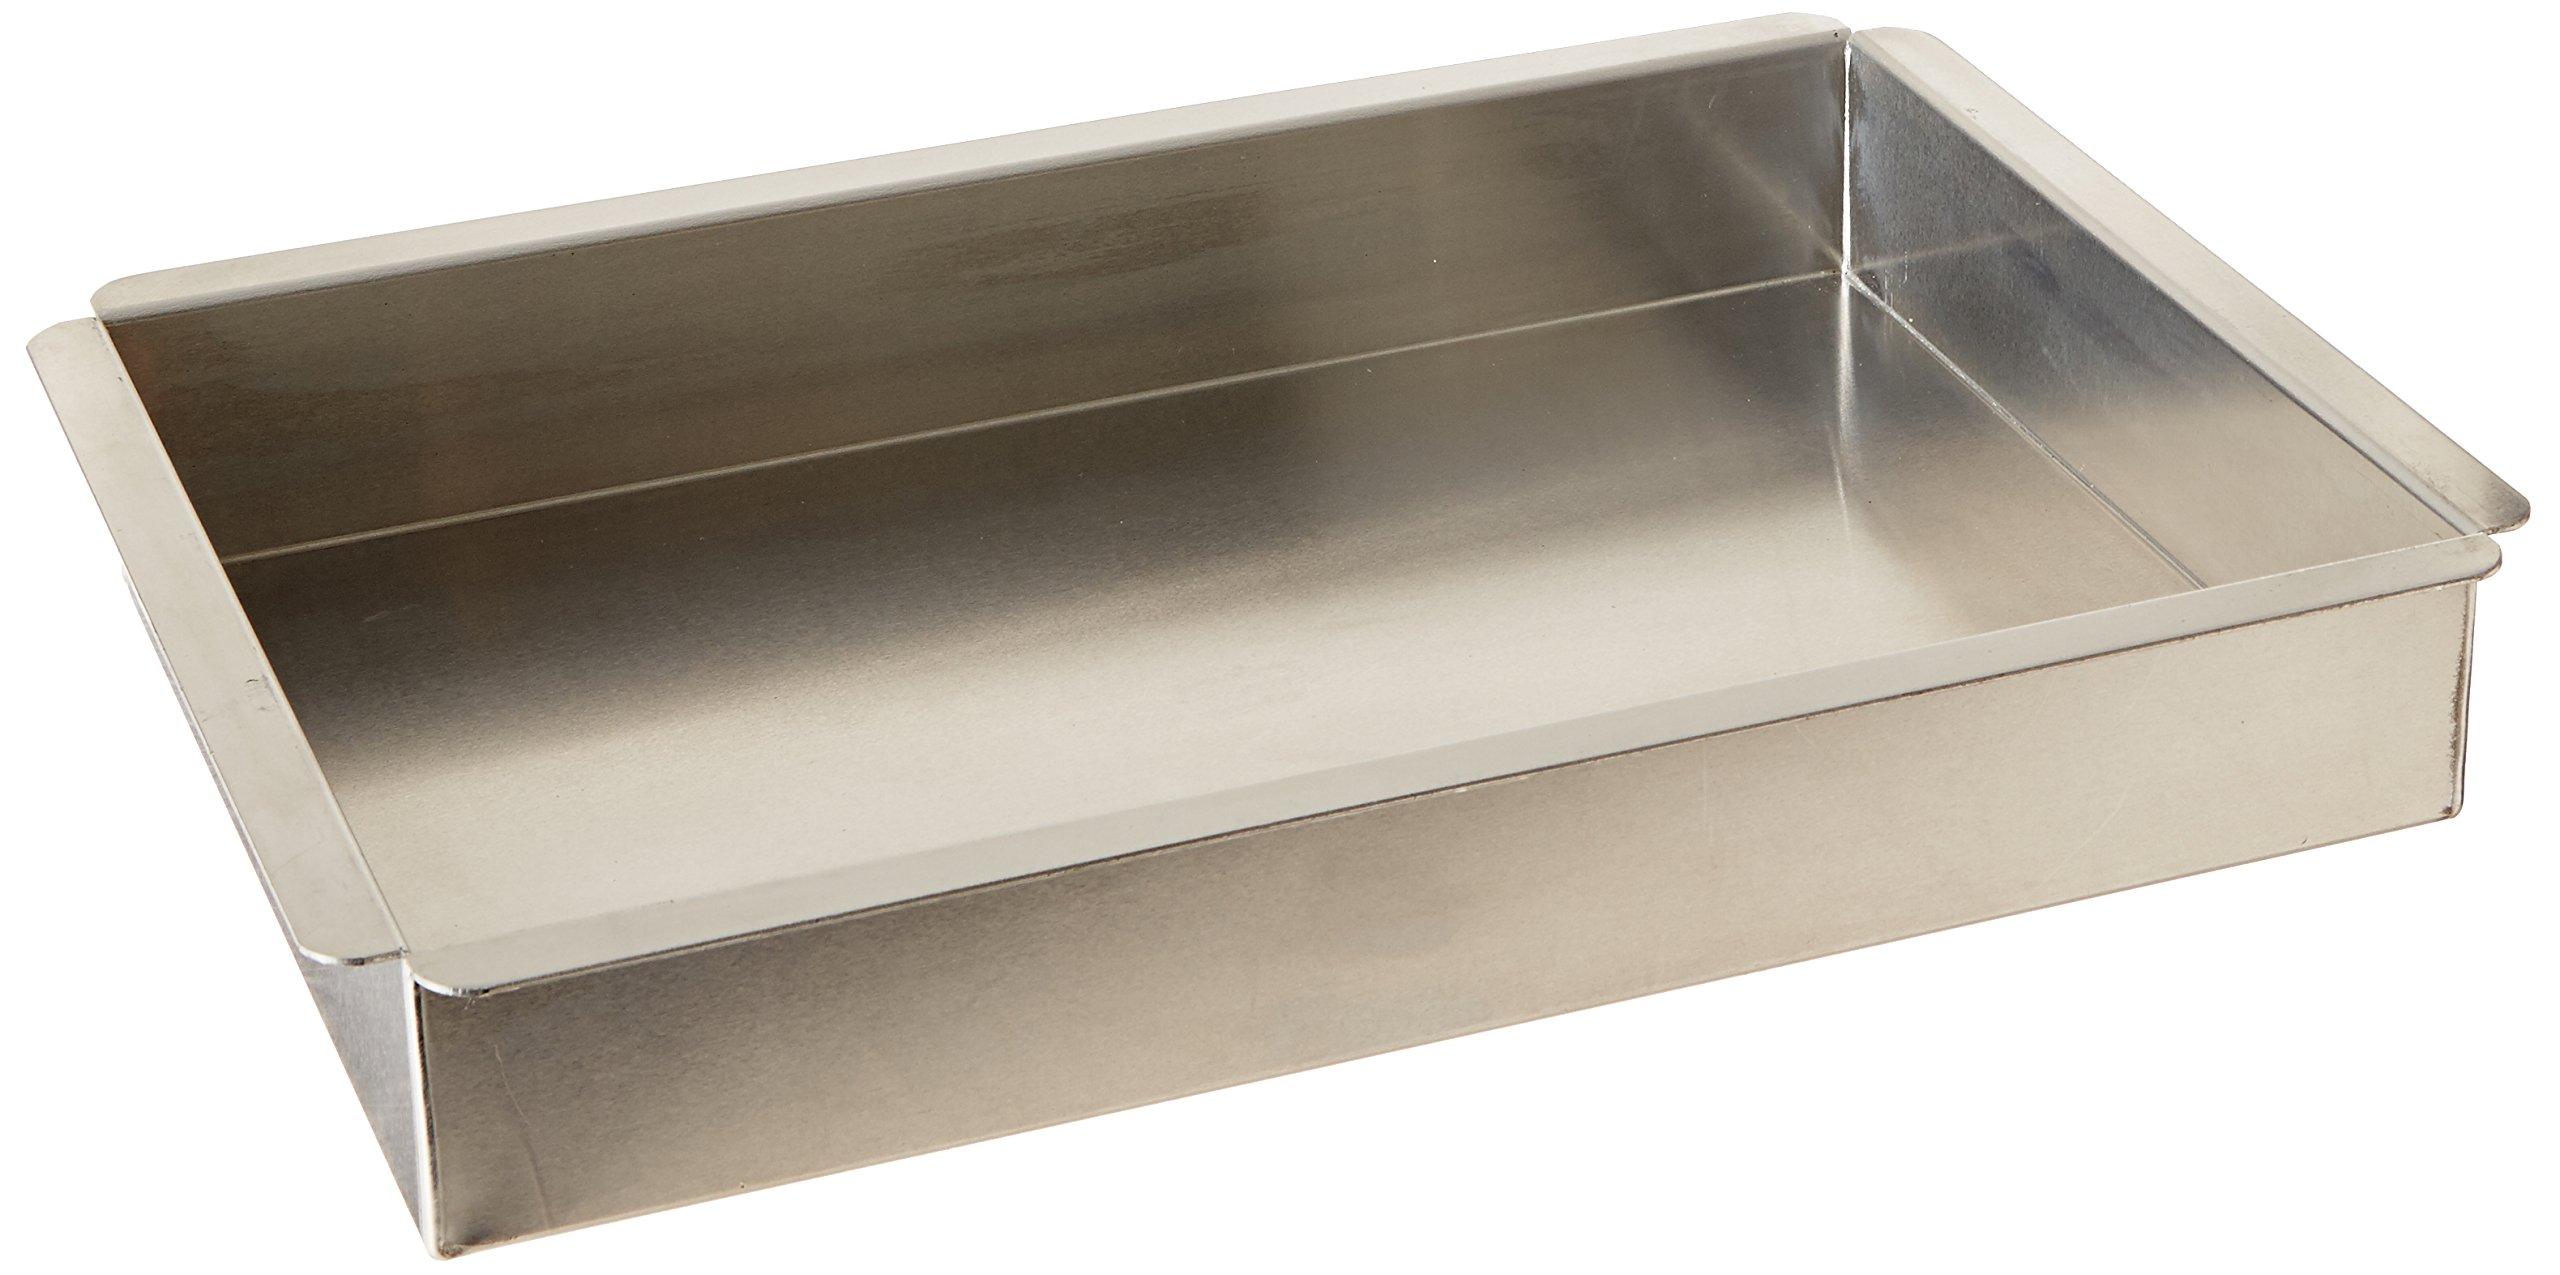 Winco ACP-0913 2-Inch Deep Aluminum Rectangular Cake Pan, 9-Inch by 13-Inch